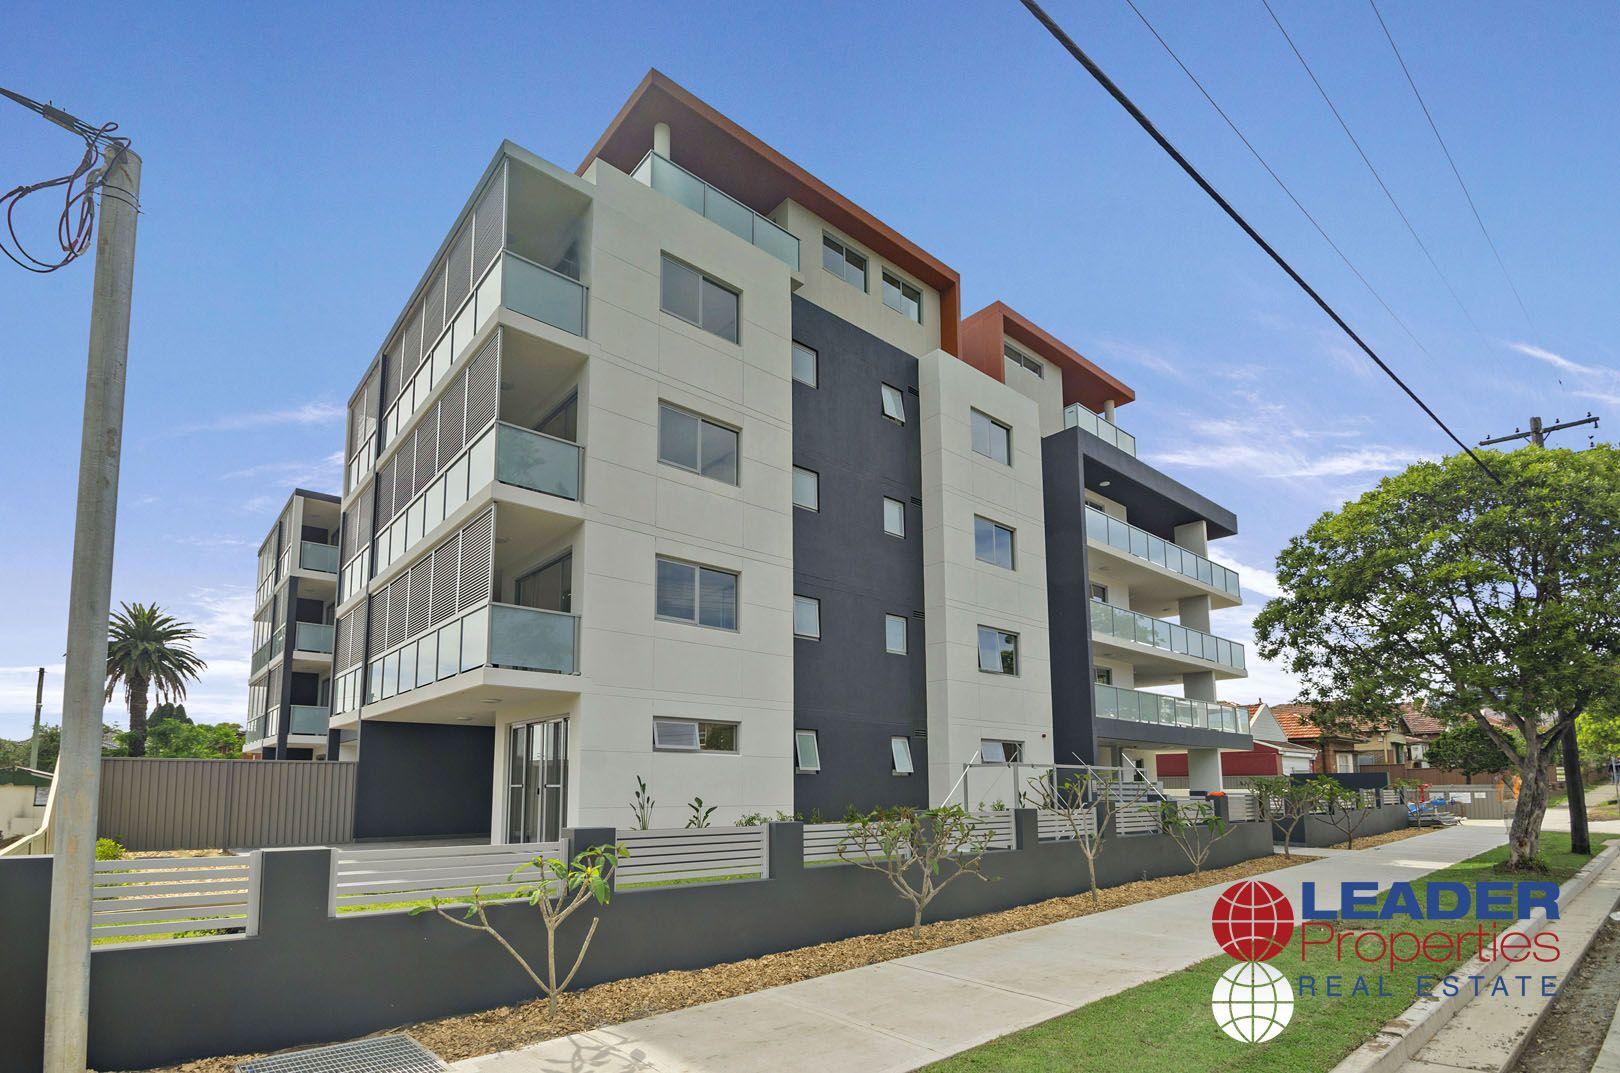 202/273-277 Burwood Road, Belmore NSW 2192, Image 0